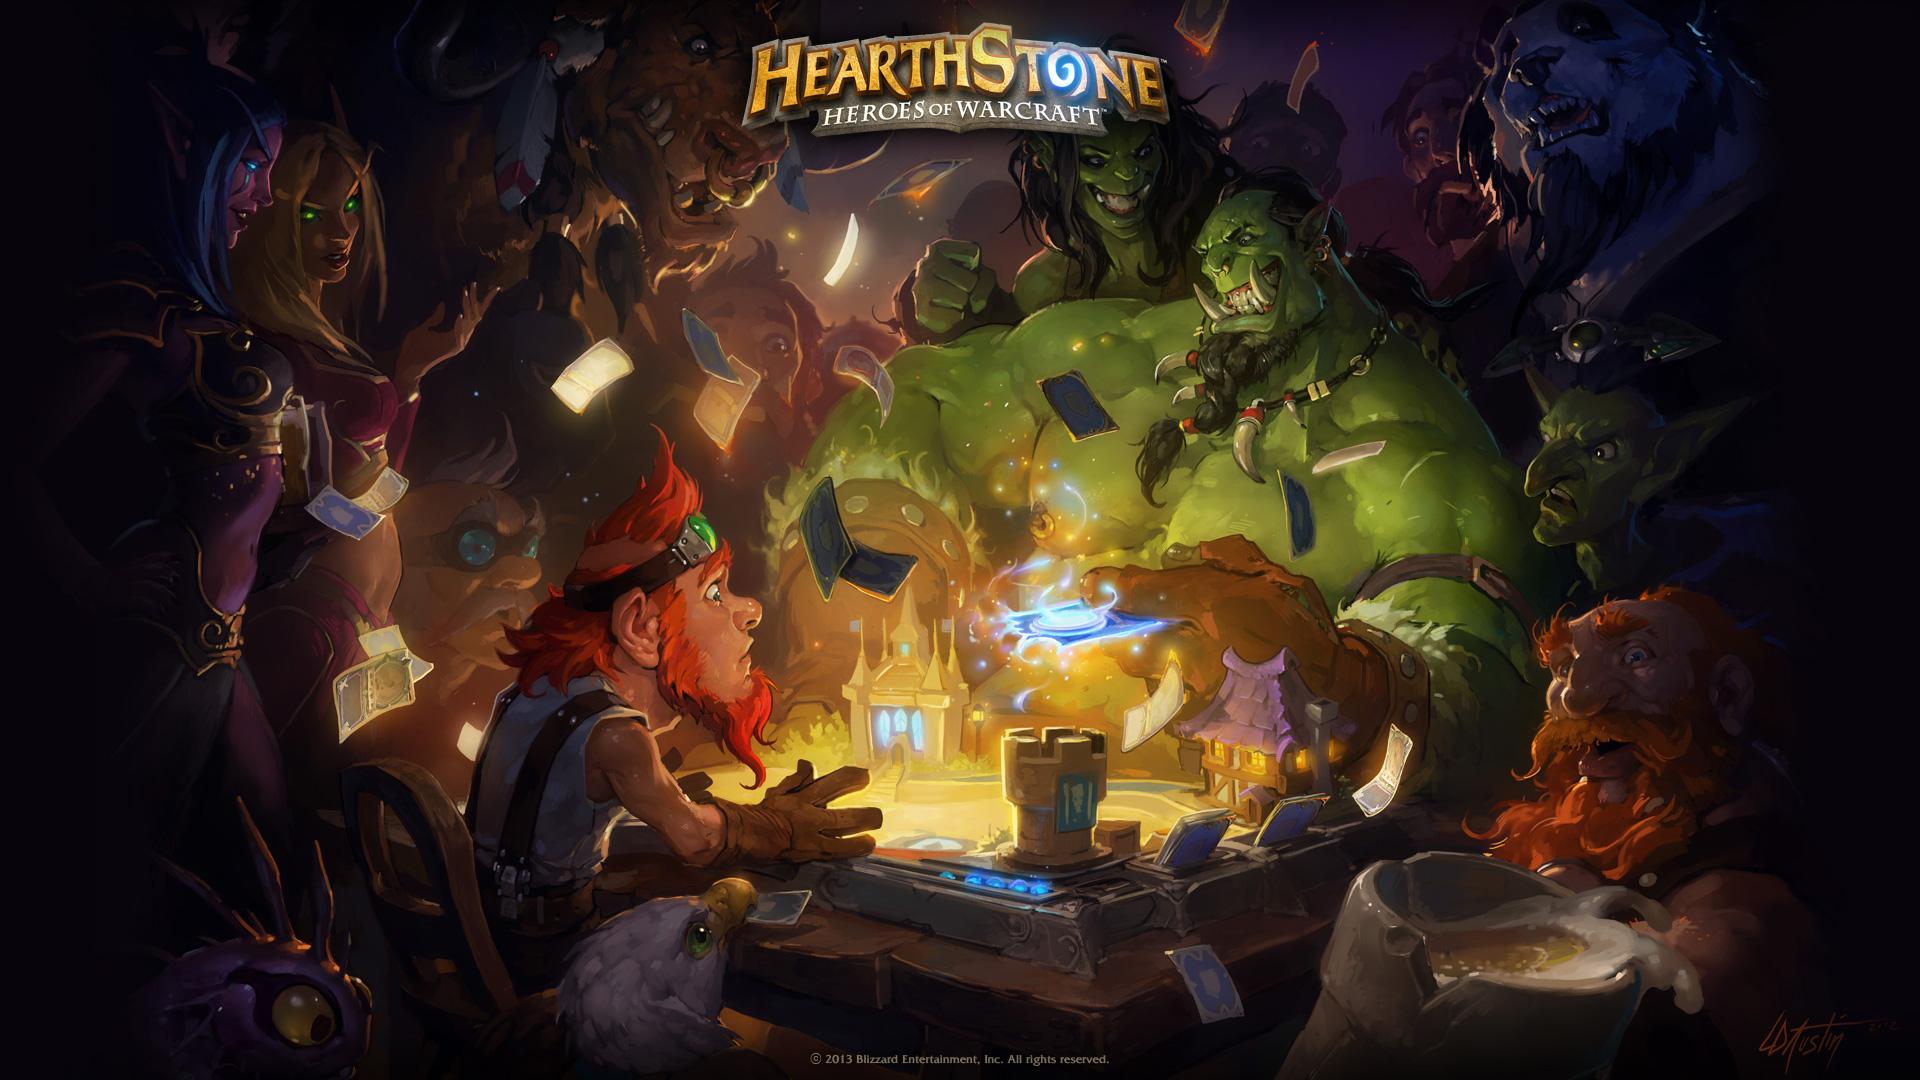 Videojocs: la màgia de 'Hearthstone'